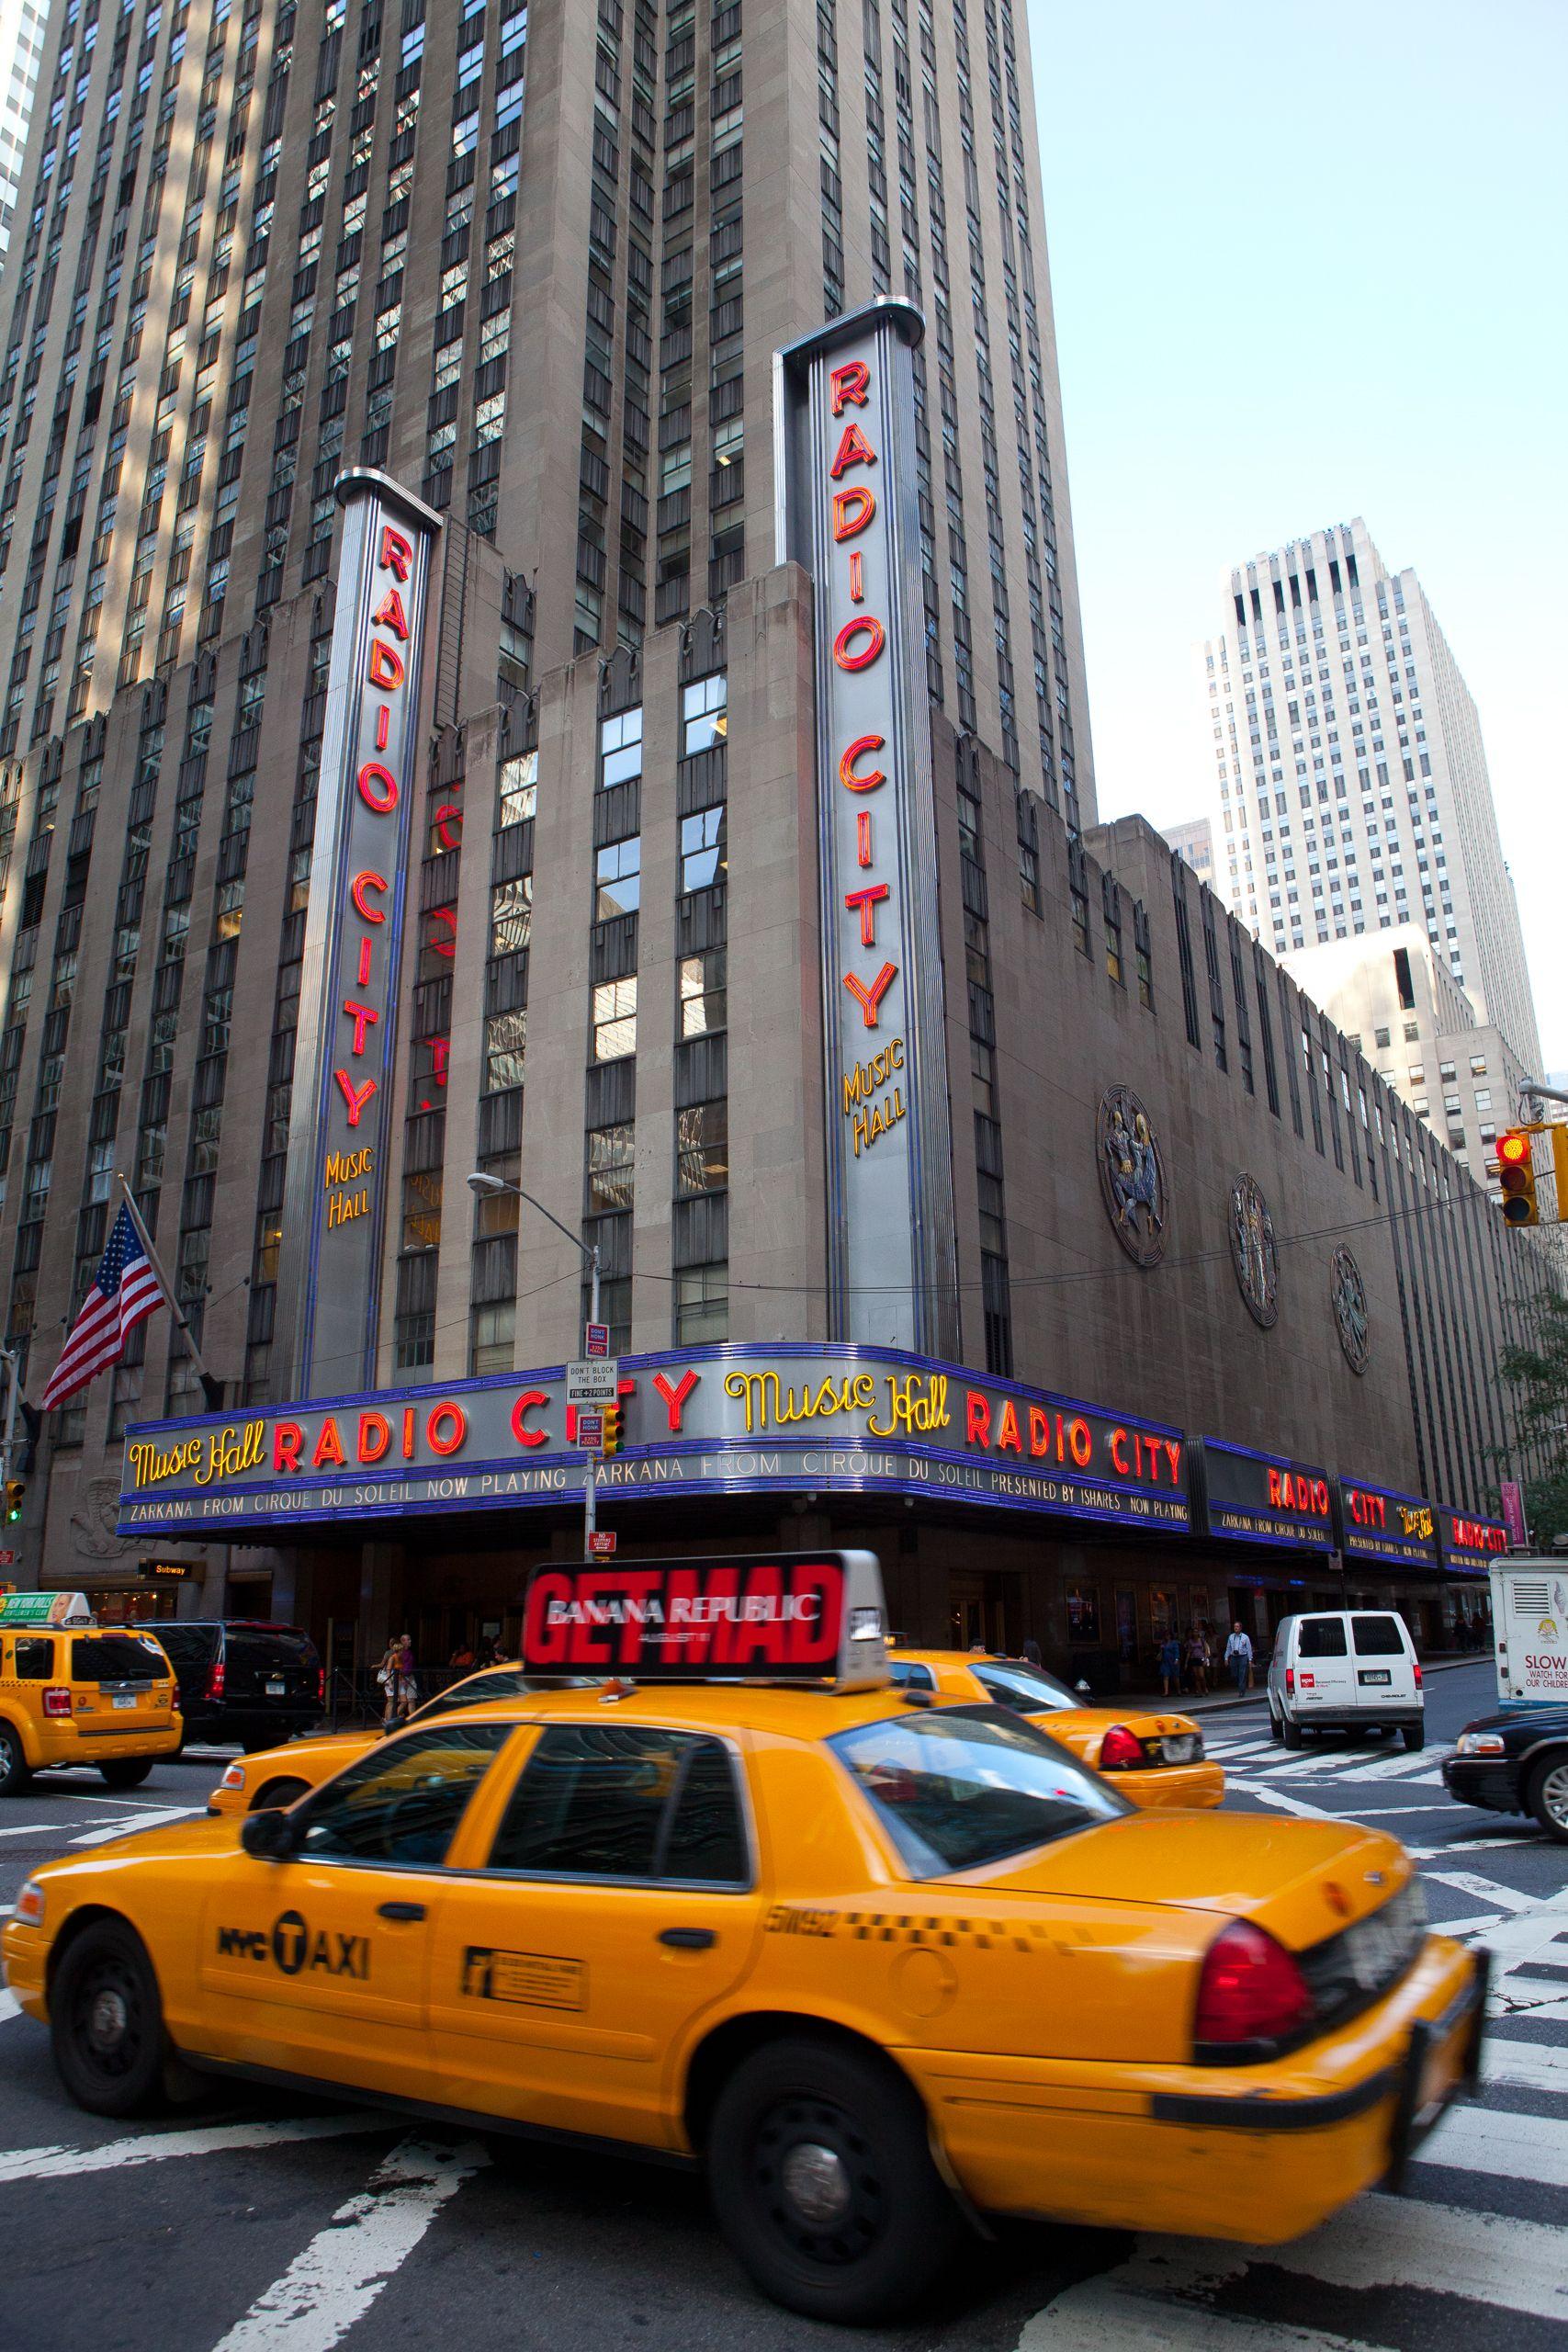 Radio City Music Hall and cab